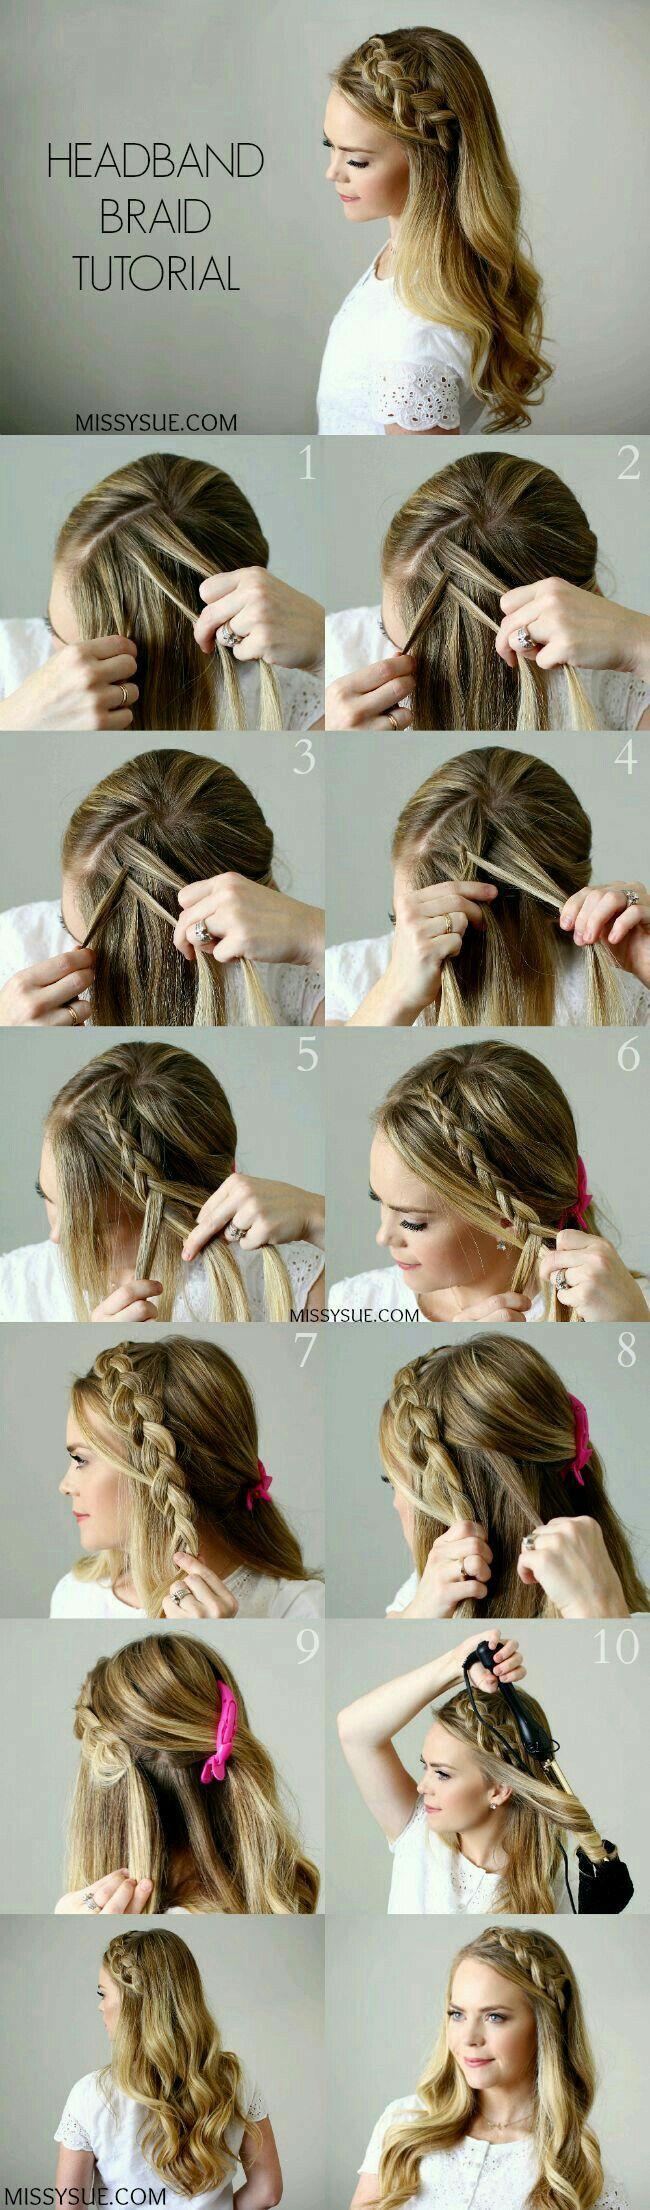 Pin by ʍϋɡɦɑɭ on ĤÁĨŔ ŚŤŶĹĔŚ pinterest hair style hair make